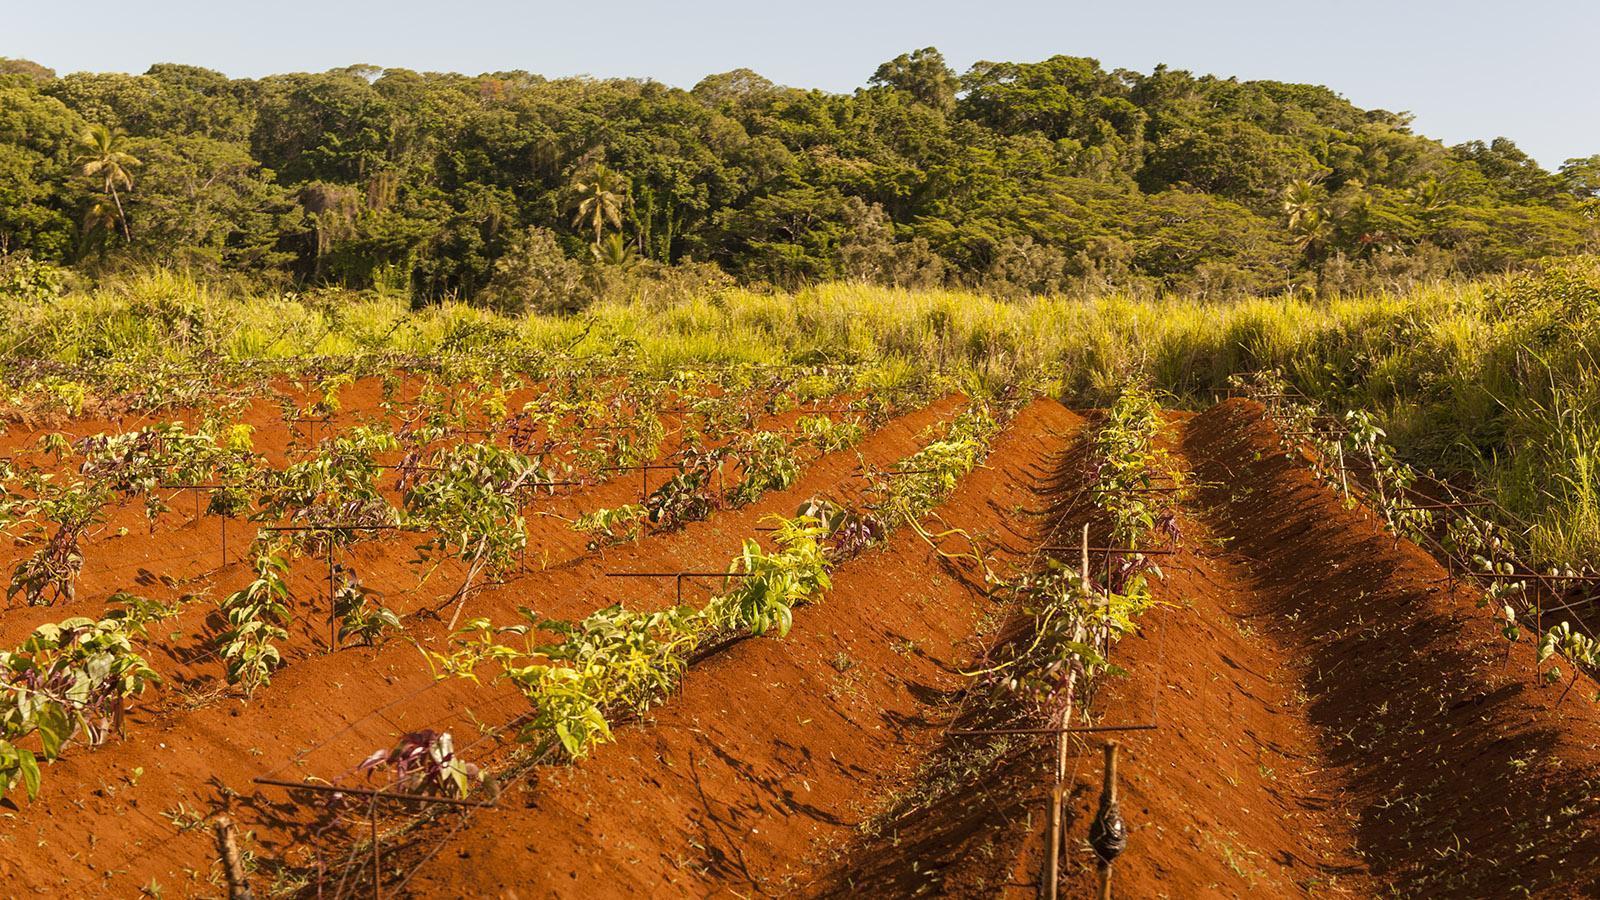 Yams-Anbau auf der Île des Pins. Foto: Hilke Maunder